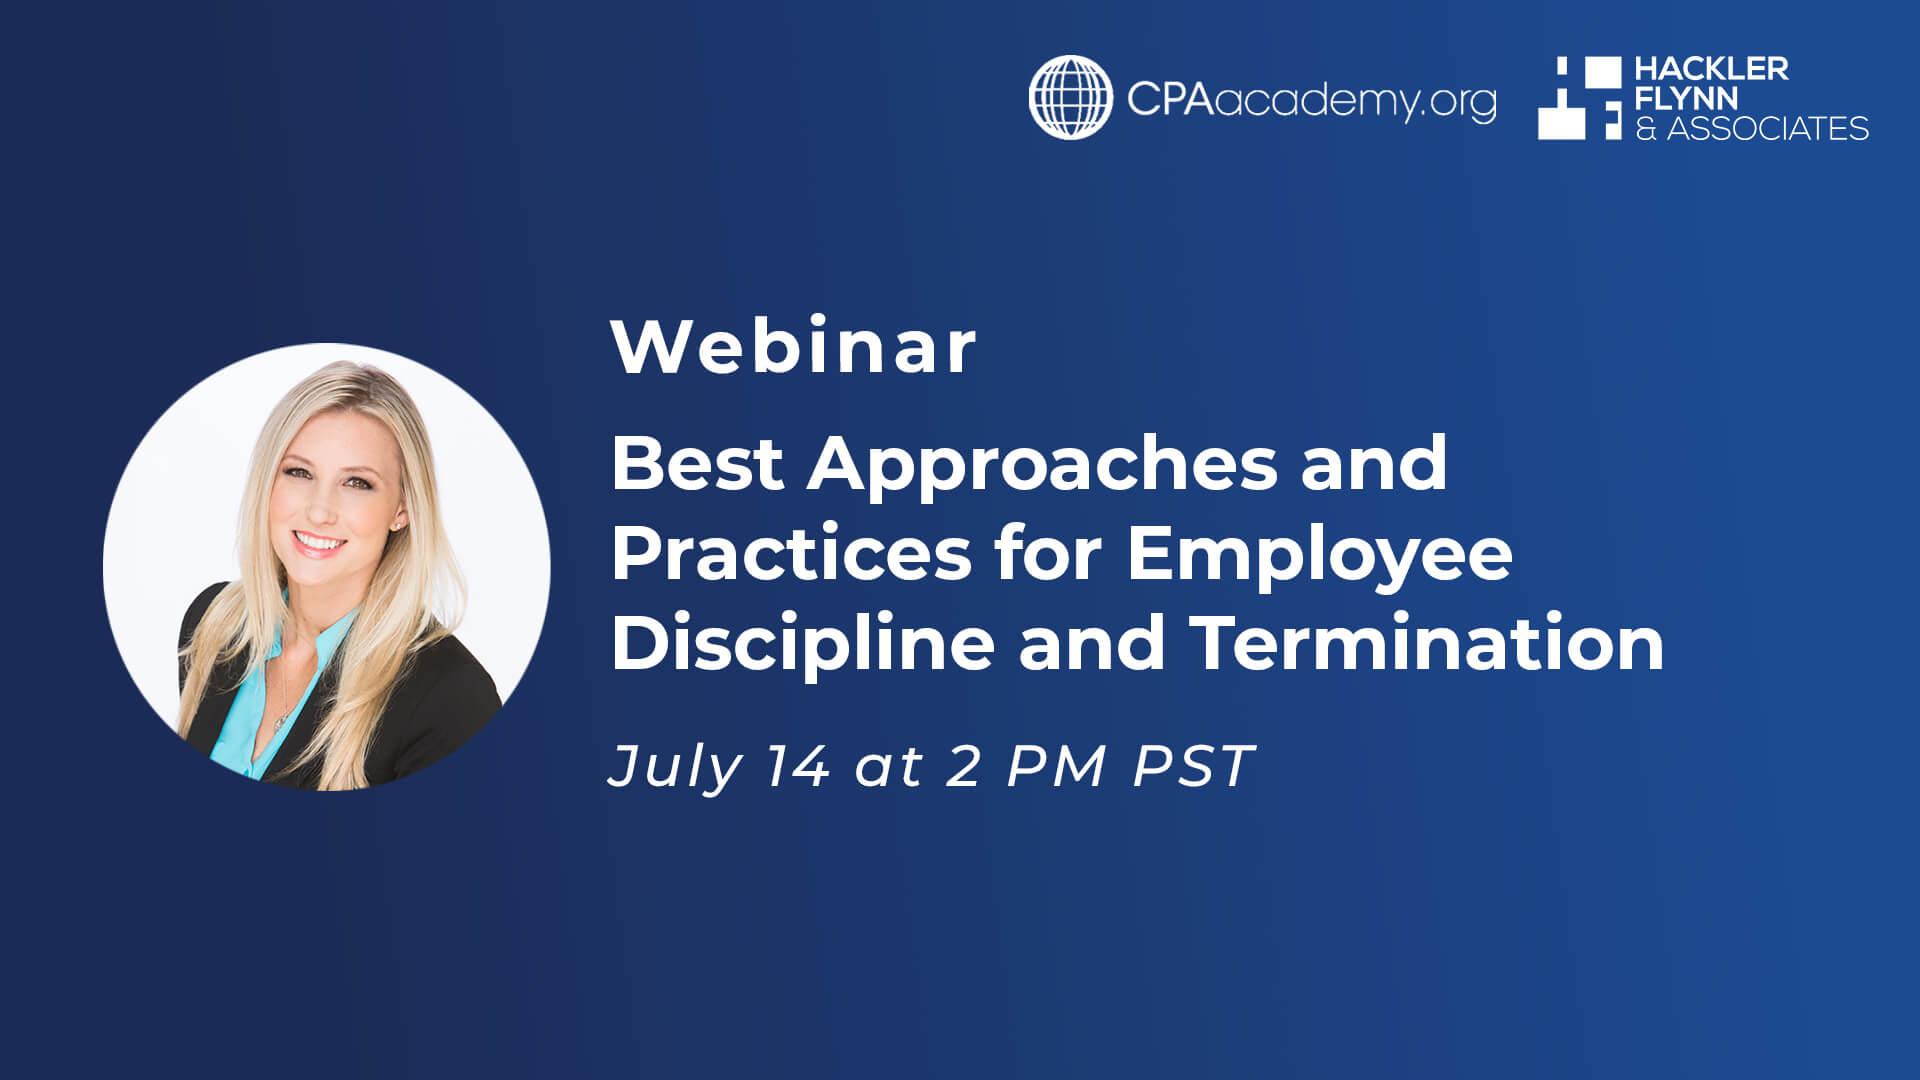 Webinar Graphic for Best Practices on Employee Discipline